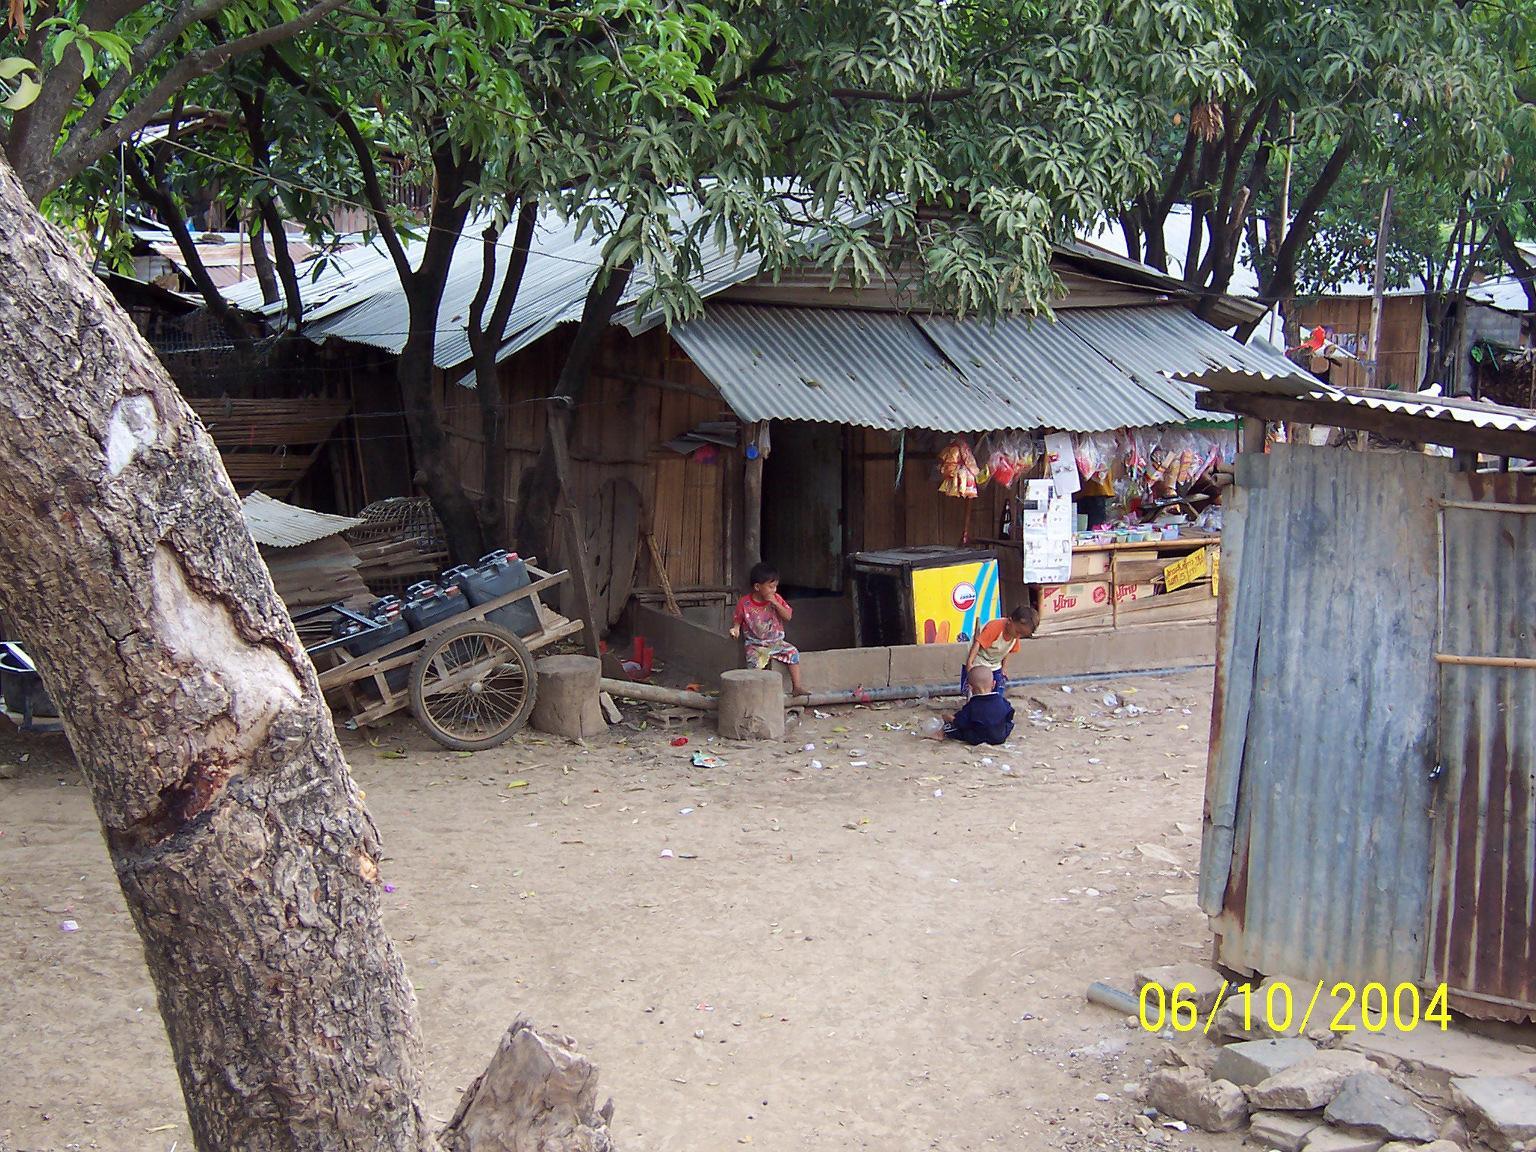 Camp shop